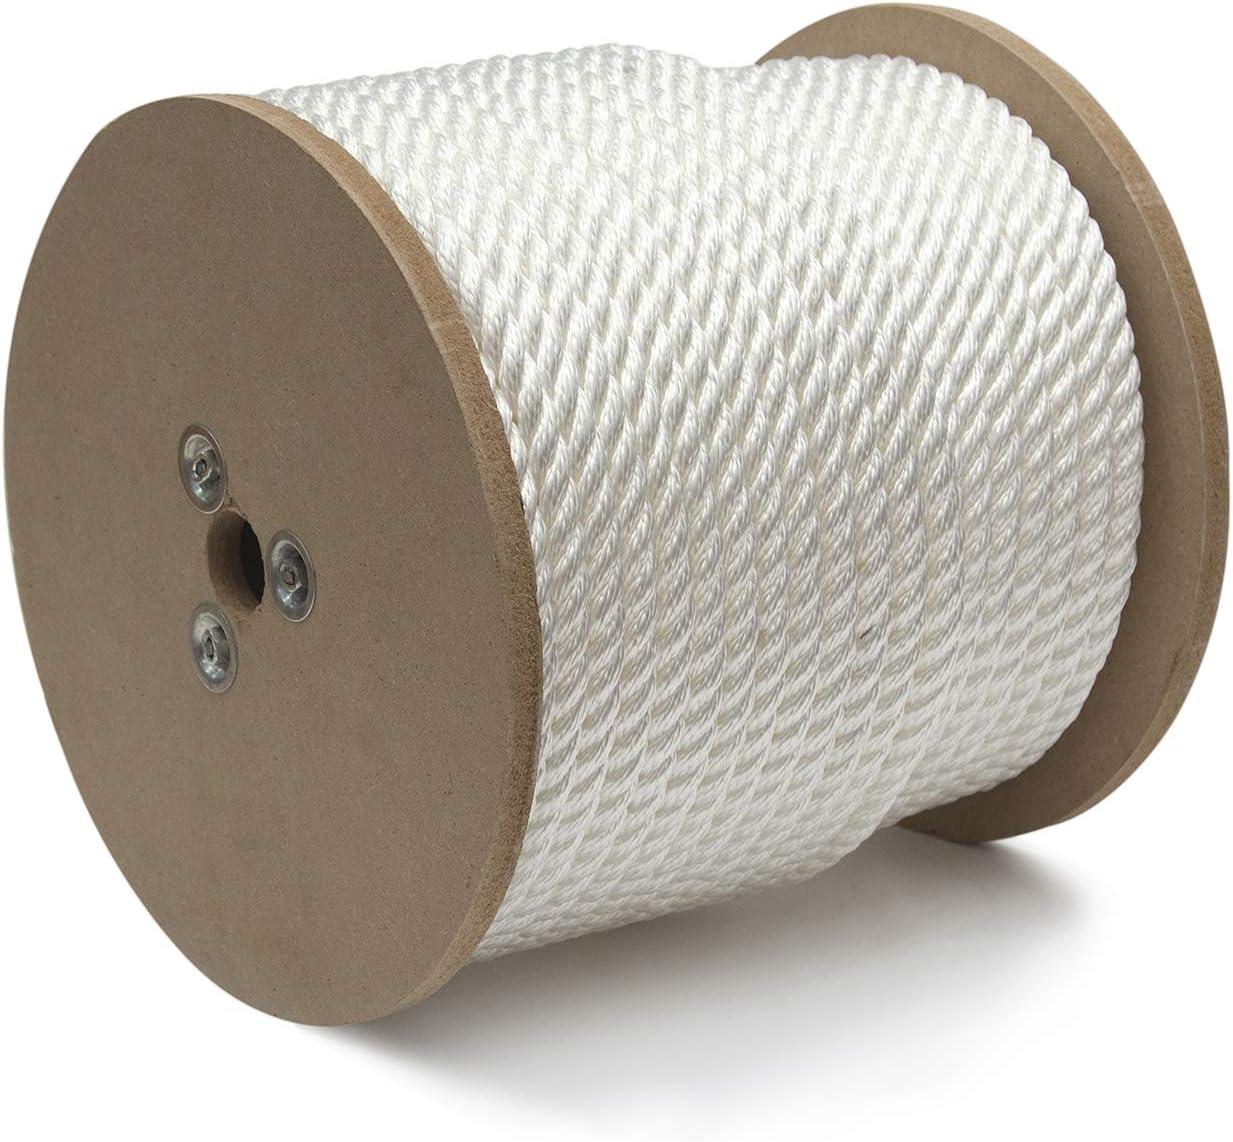 "KingCord 300491 Nylon Twisted Rope Reel 3/4"" x 150', White"